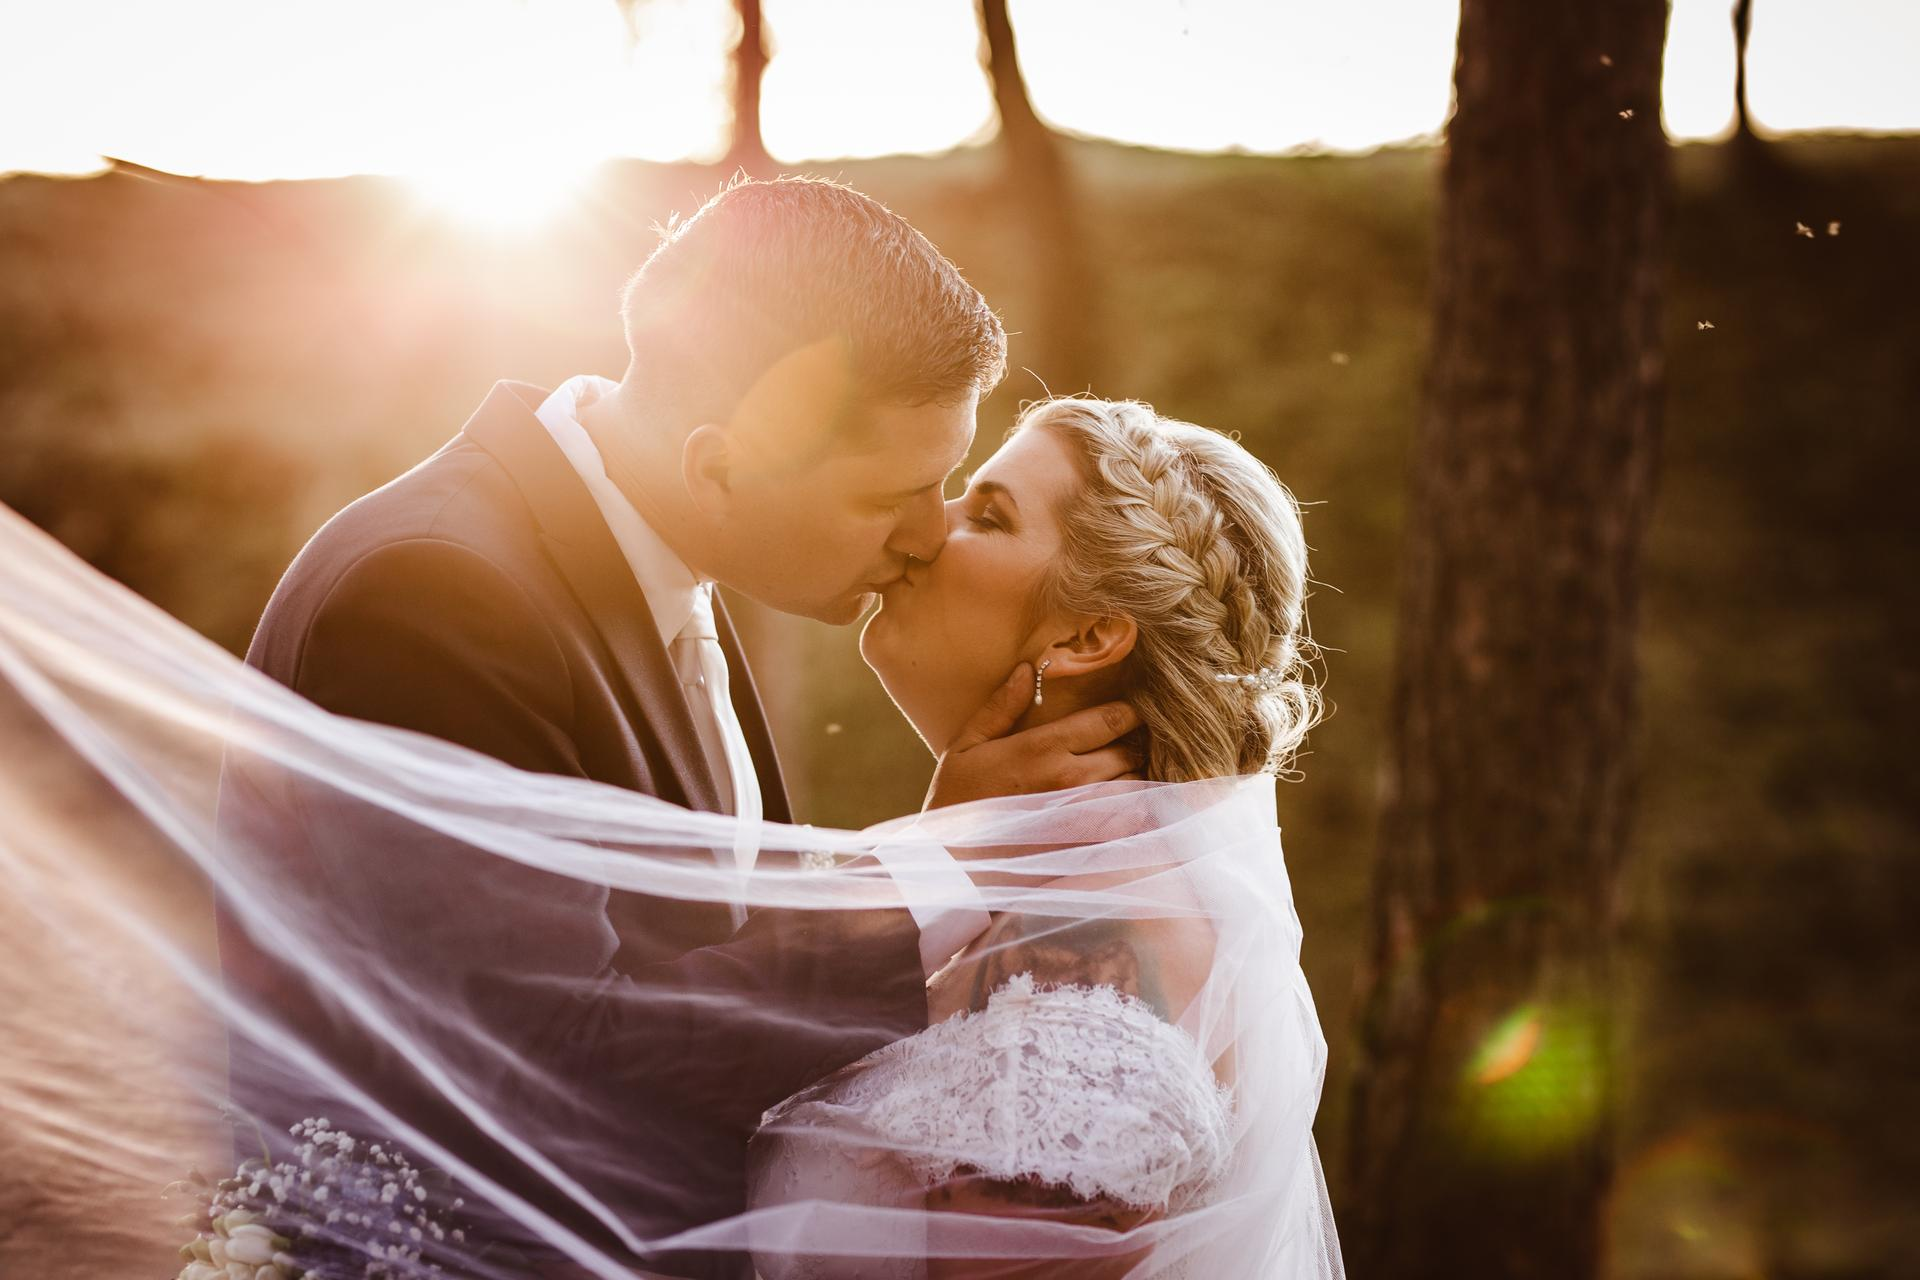 Sluníčko sluníčko...krásný západ slunce na svatbě u Slezské Harty  Stále mám volné termíny na rok 2021...pište/volejte si o ně 🙂, ráda za vámi přijedu po celé ČR. - Obrázek č. 1